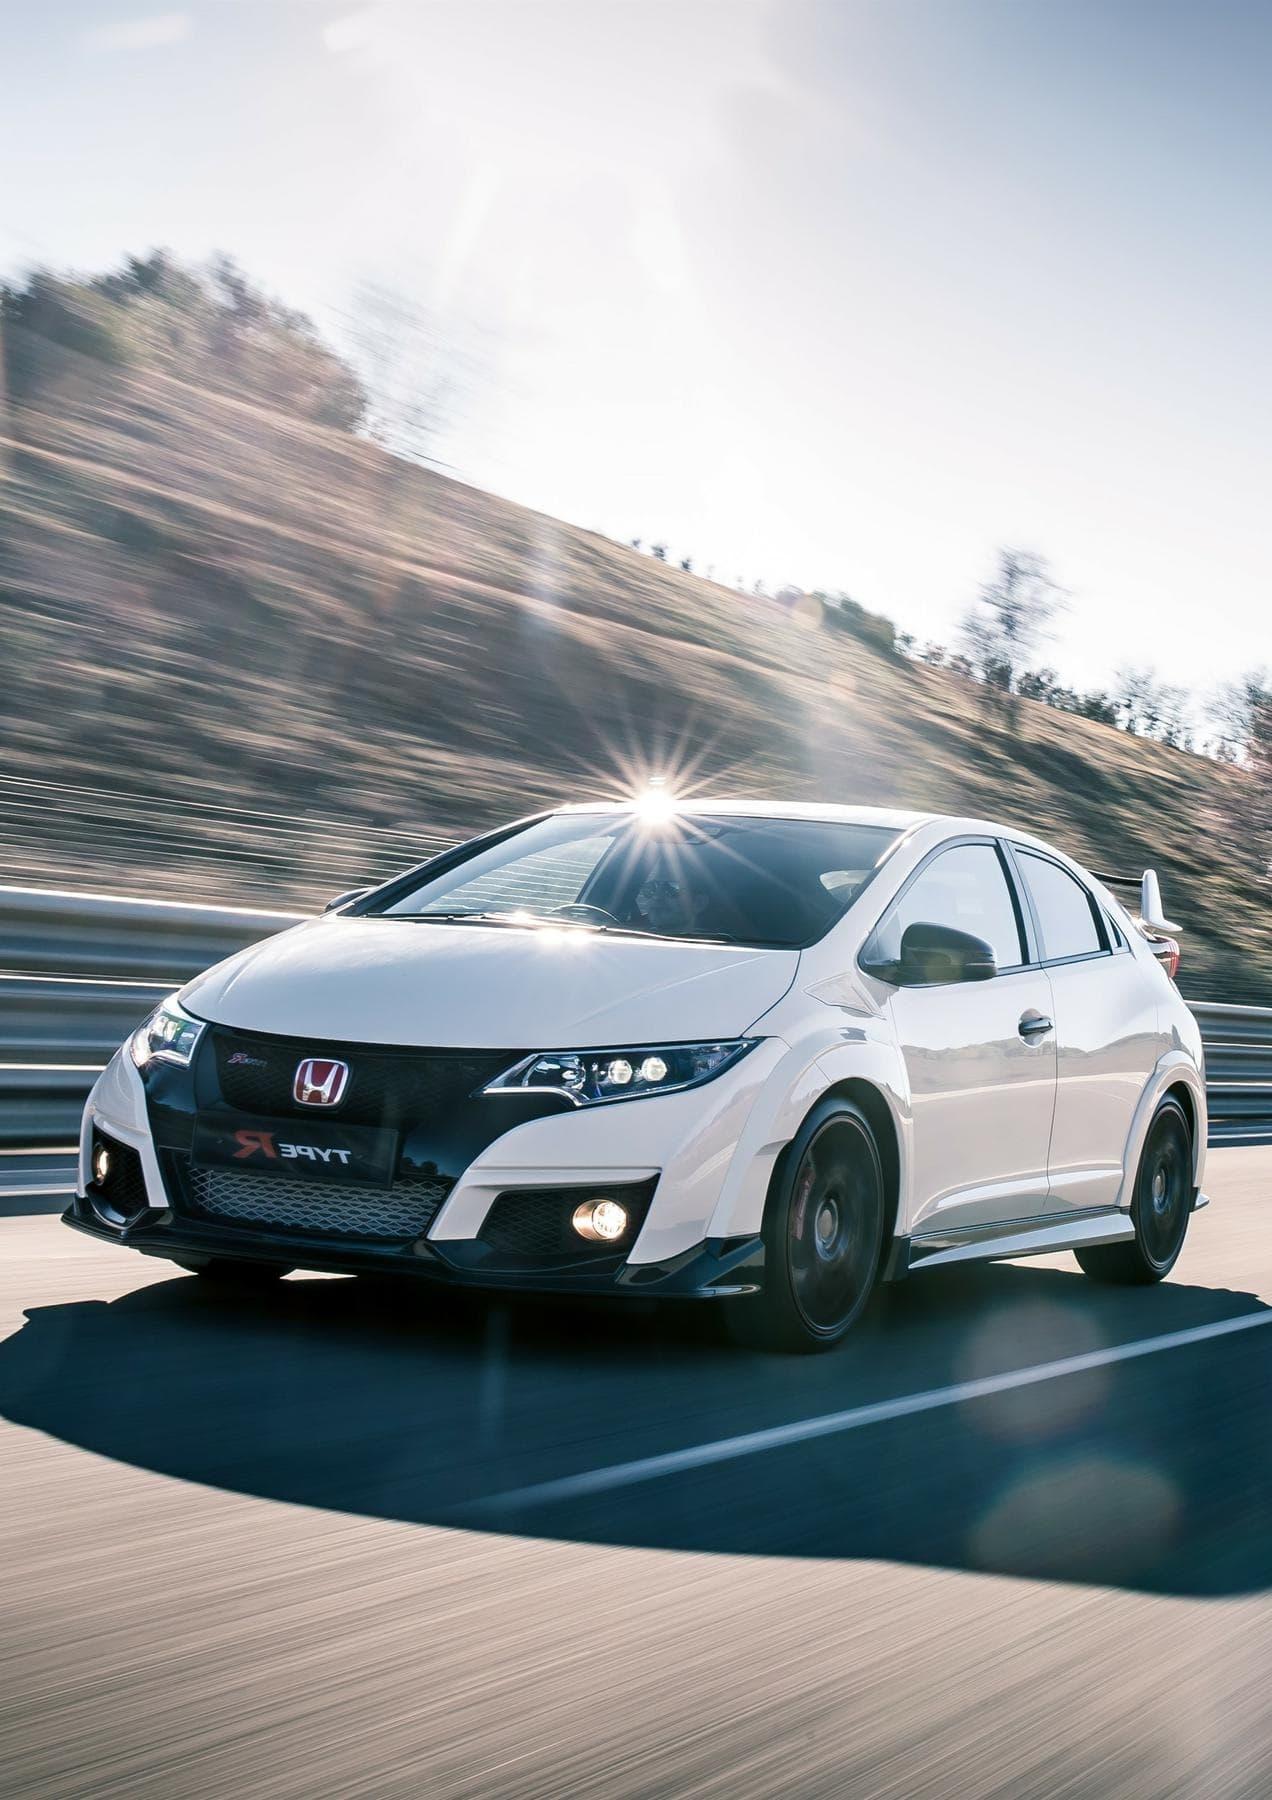 Honda Civic Type R Hd Wallpapers 7wallpapers Net